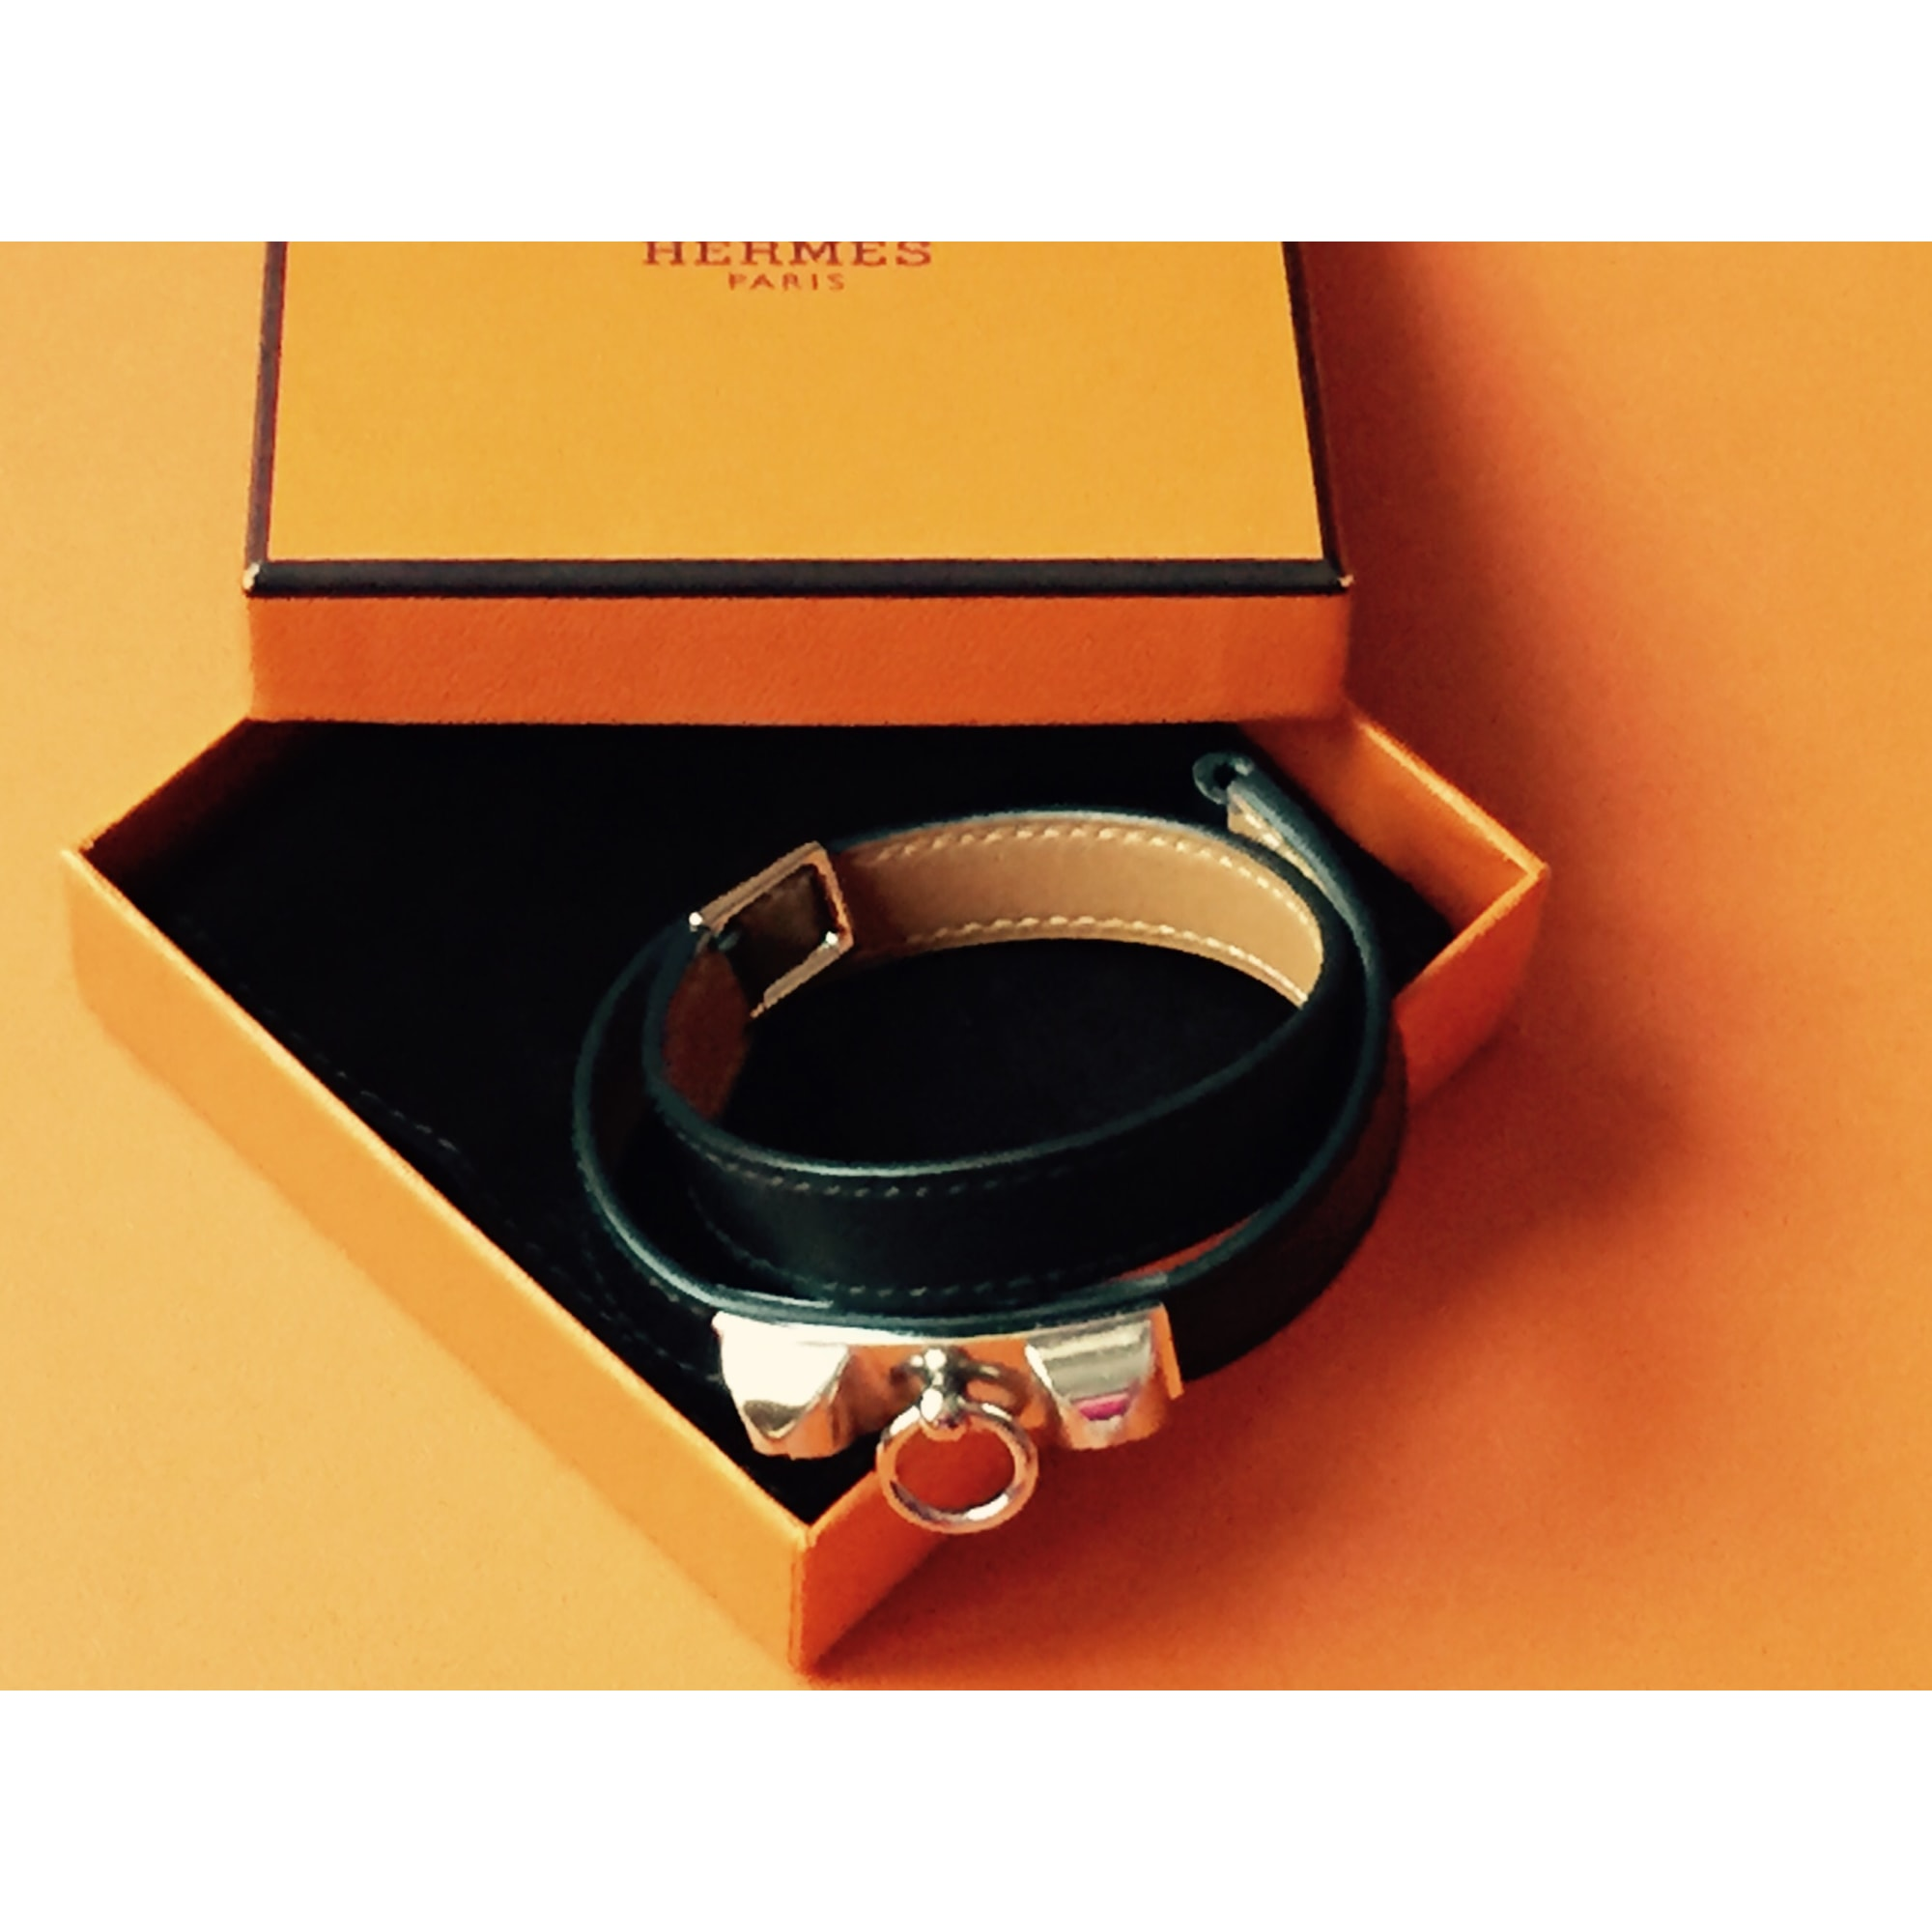 Bracelet HERMÈS noir vendu par Dustin443445 - 3243986 f7ed2a43dbd